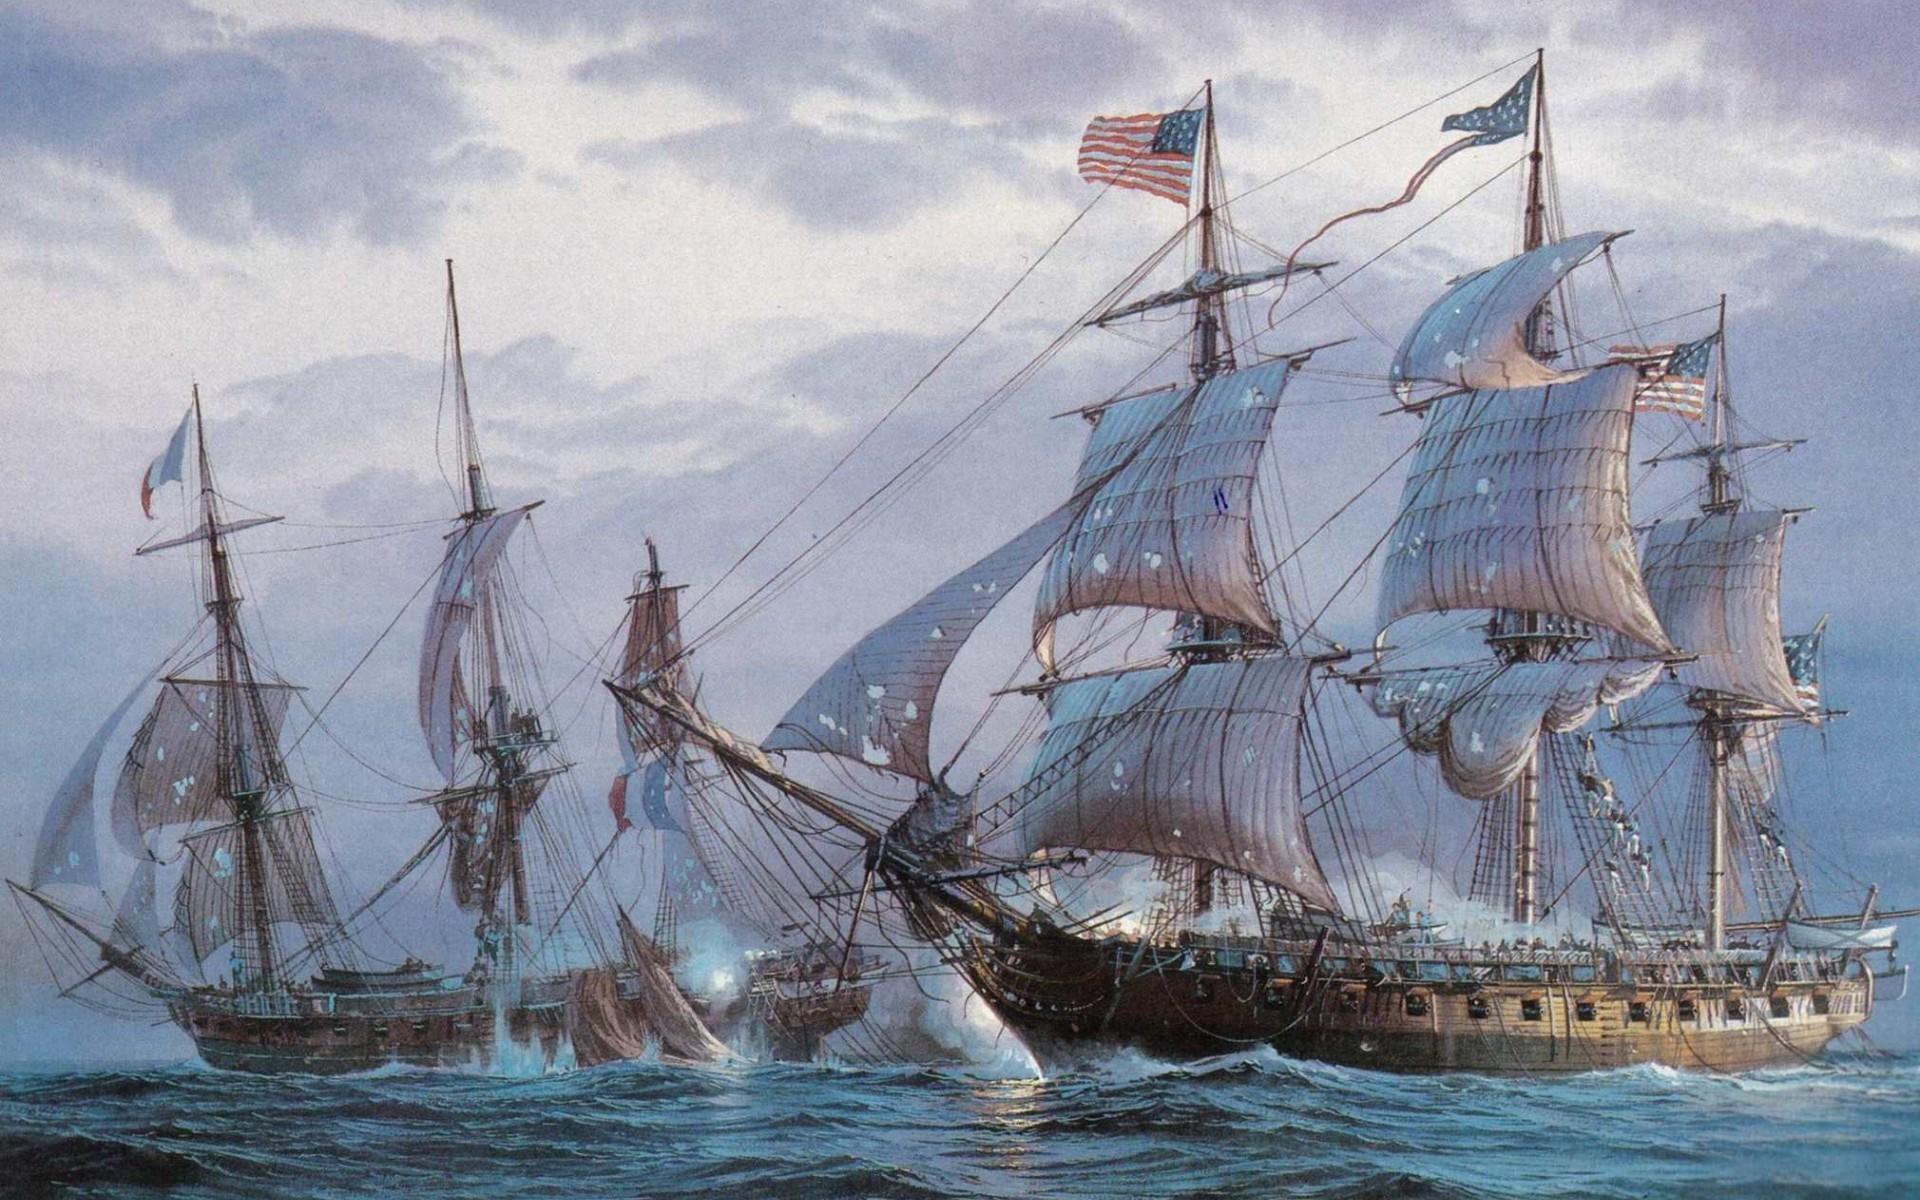 General 1920x1200 painting sailing ship American flag sea ship artwork rigging (ship) vehicle